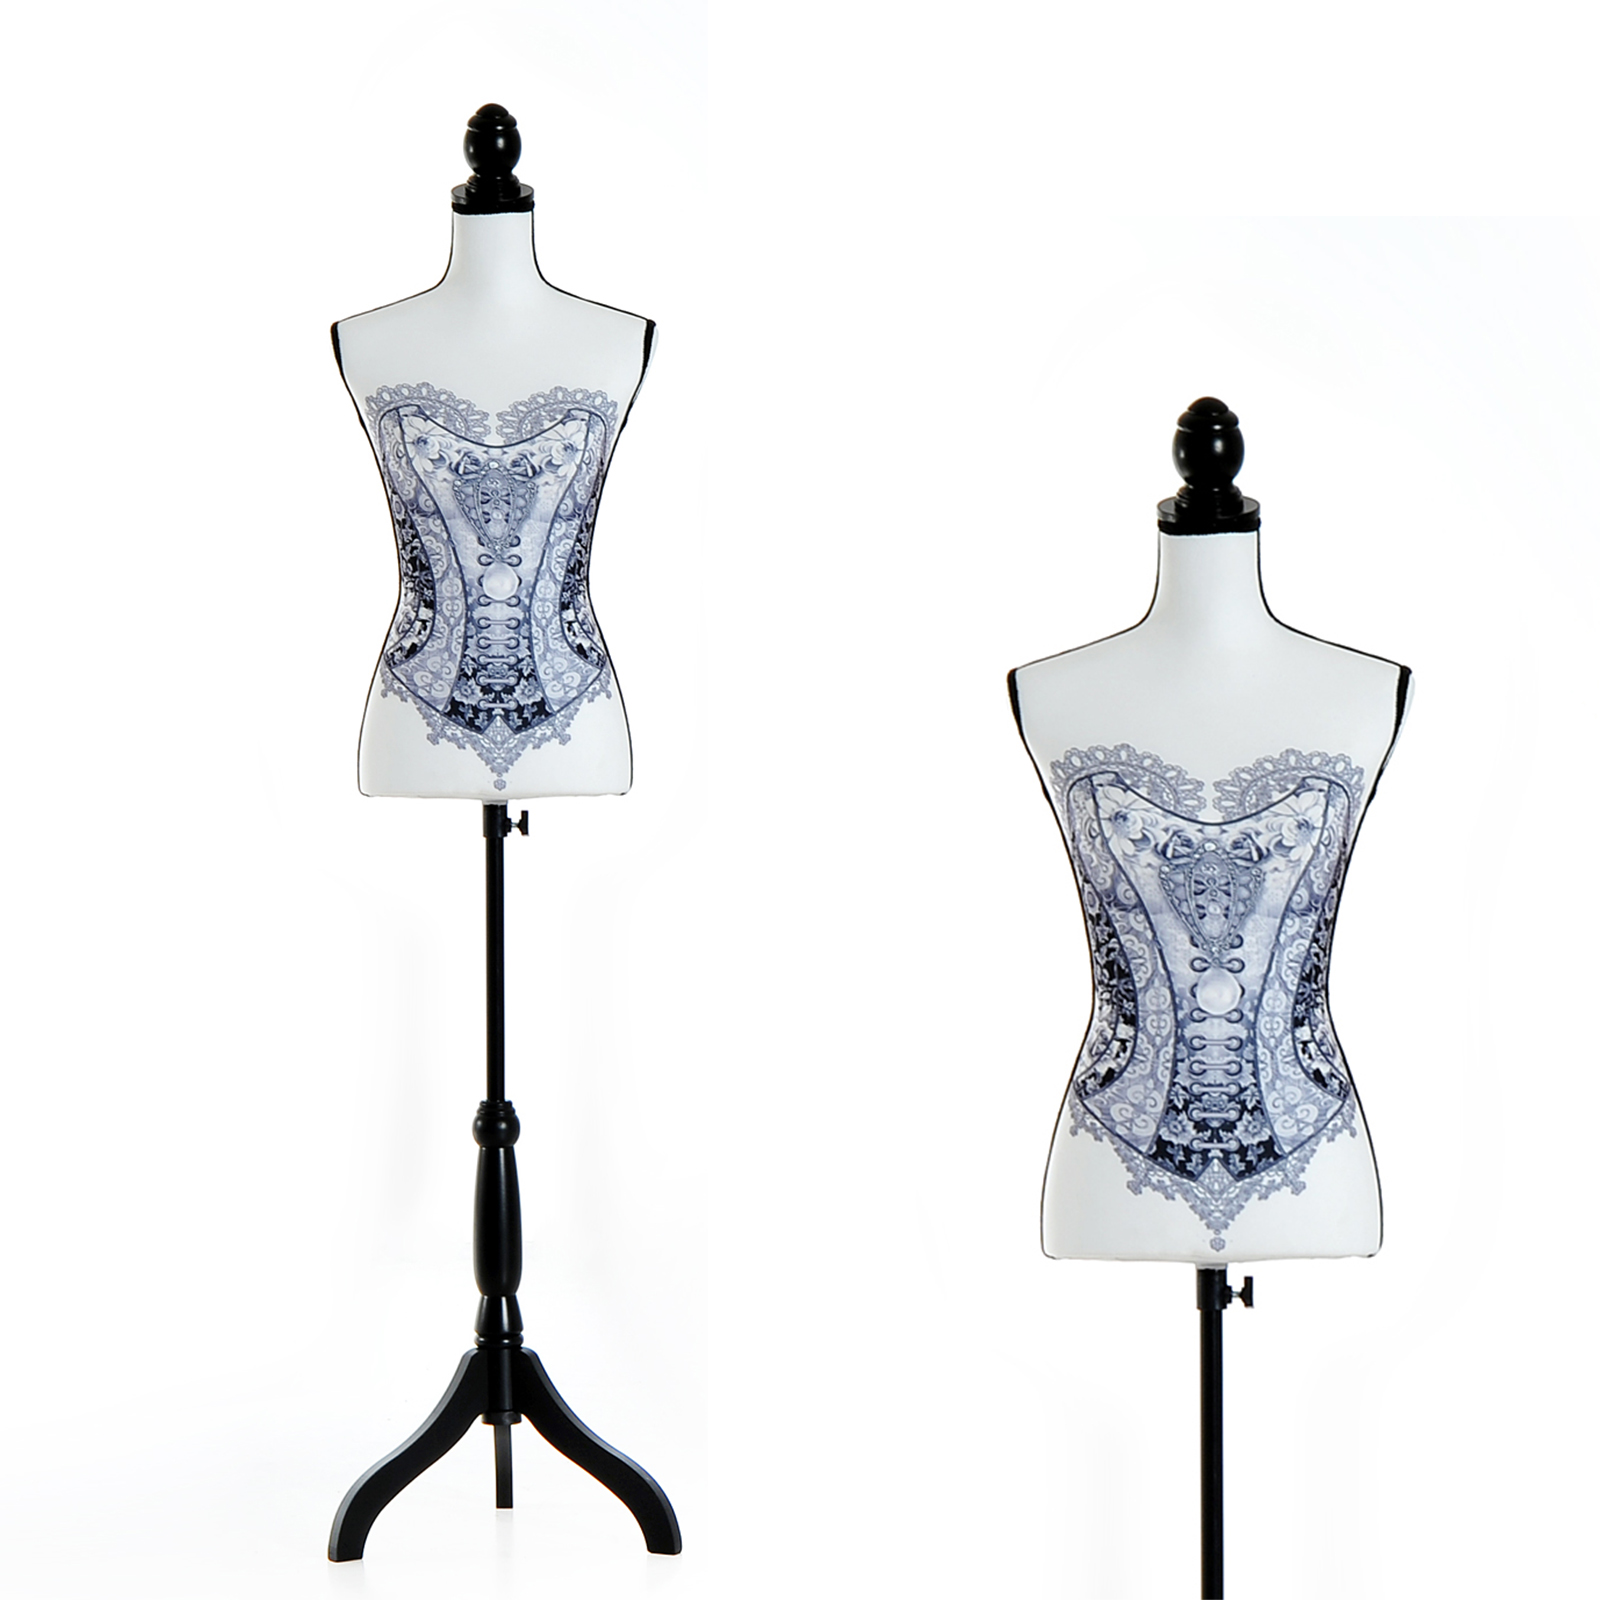 Maniqui-Femenino-de-Costura-Busto-de-Senora-para-Exposicion-Modista-130-168cm miniatura 14